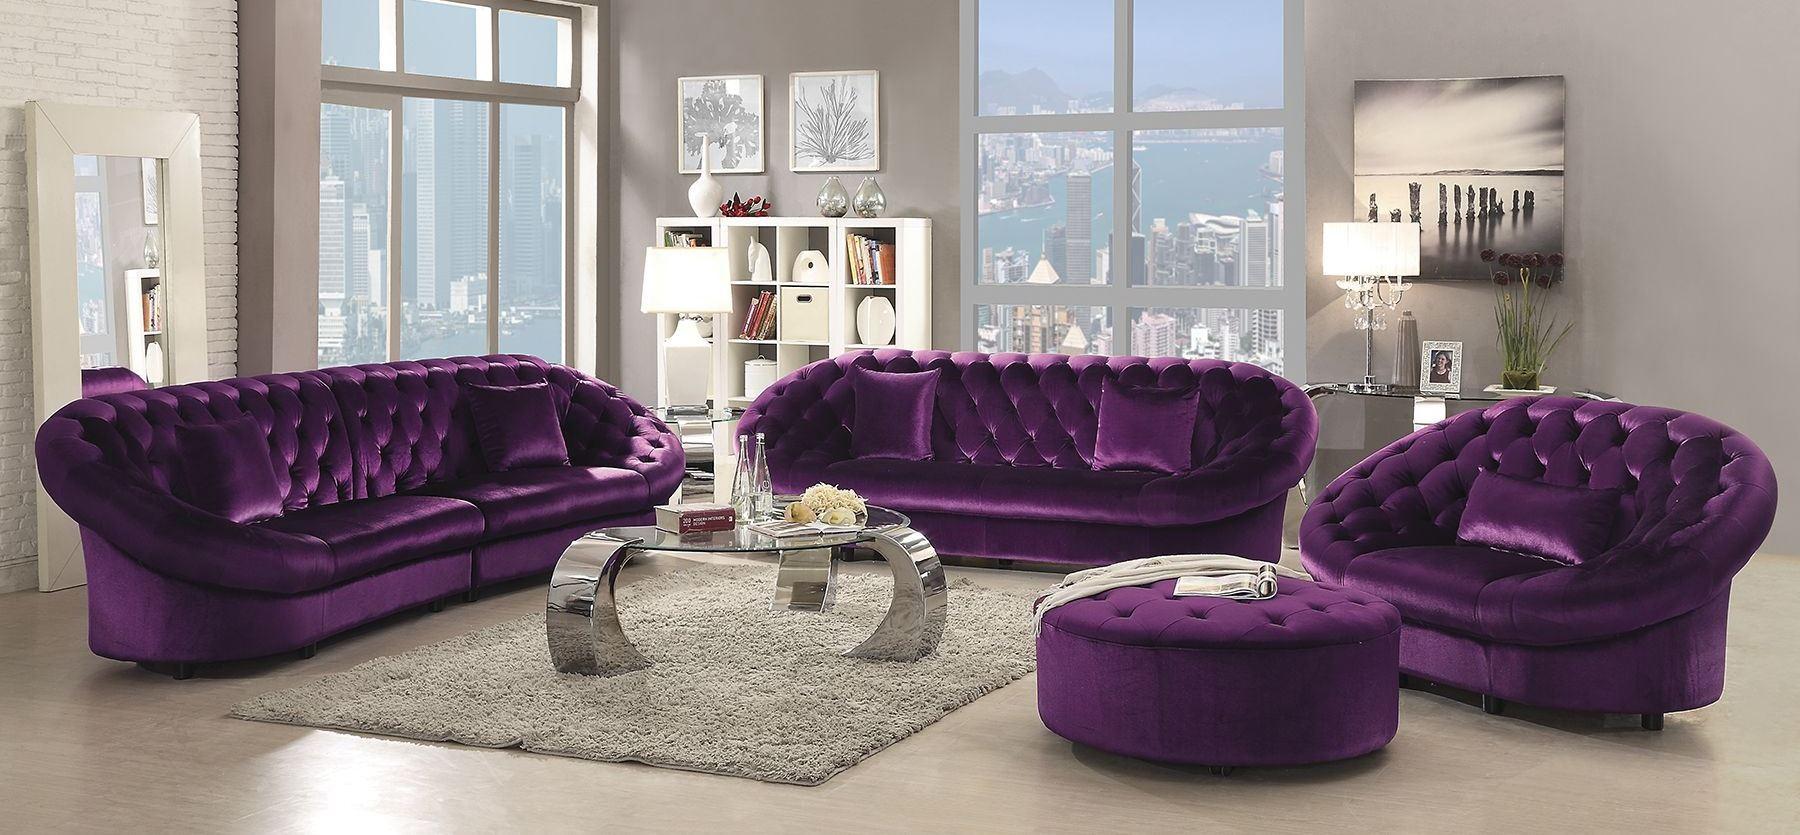 Romanus Purple Velvet Living Room Set 511046 Coaster Furniture